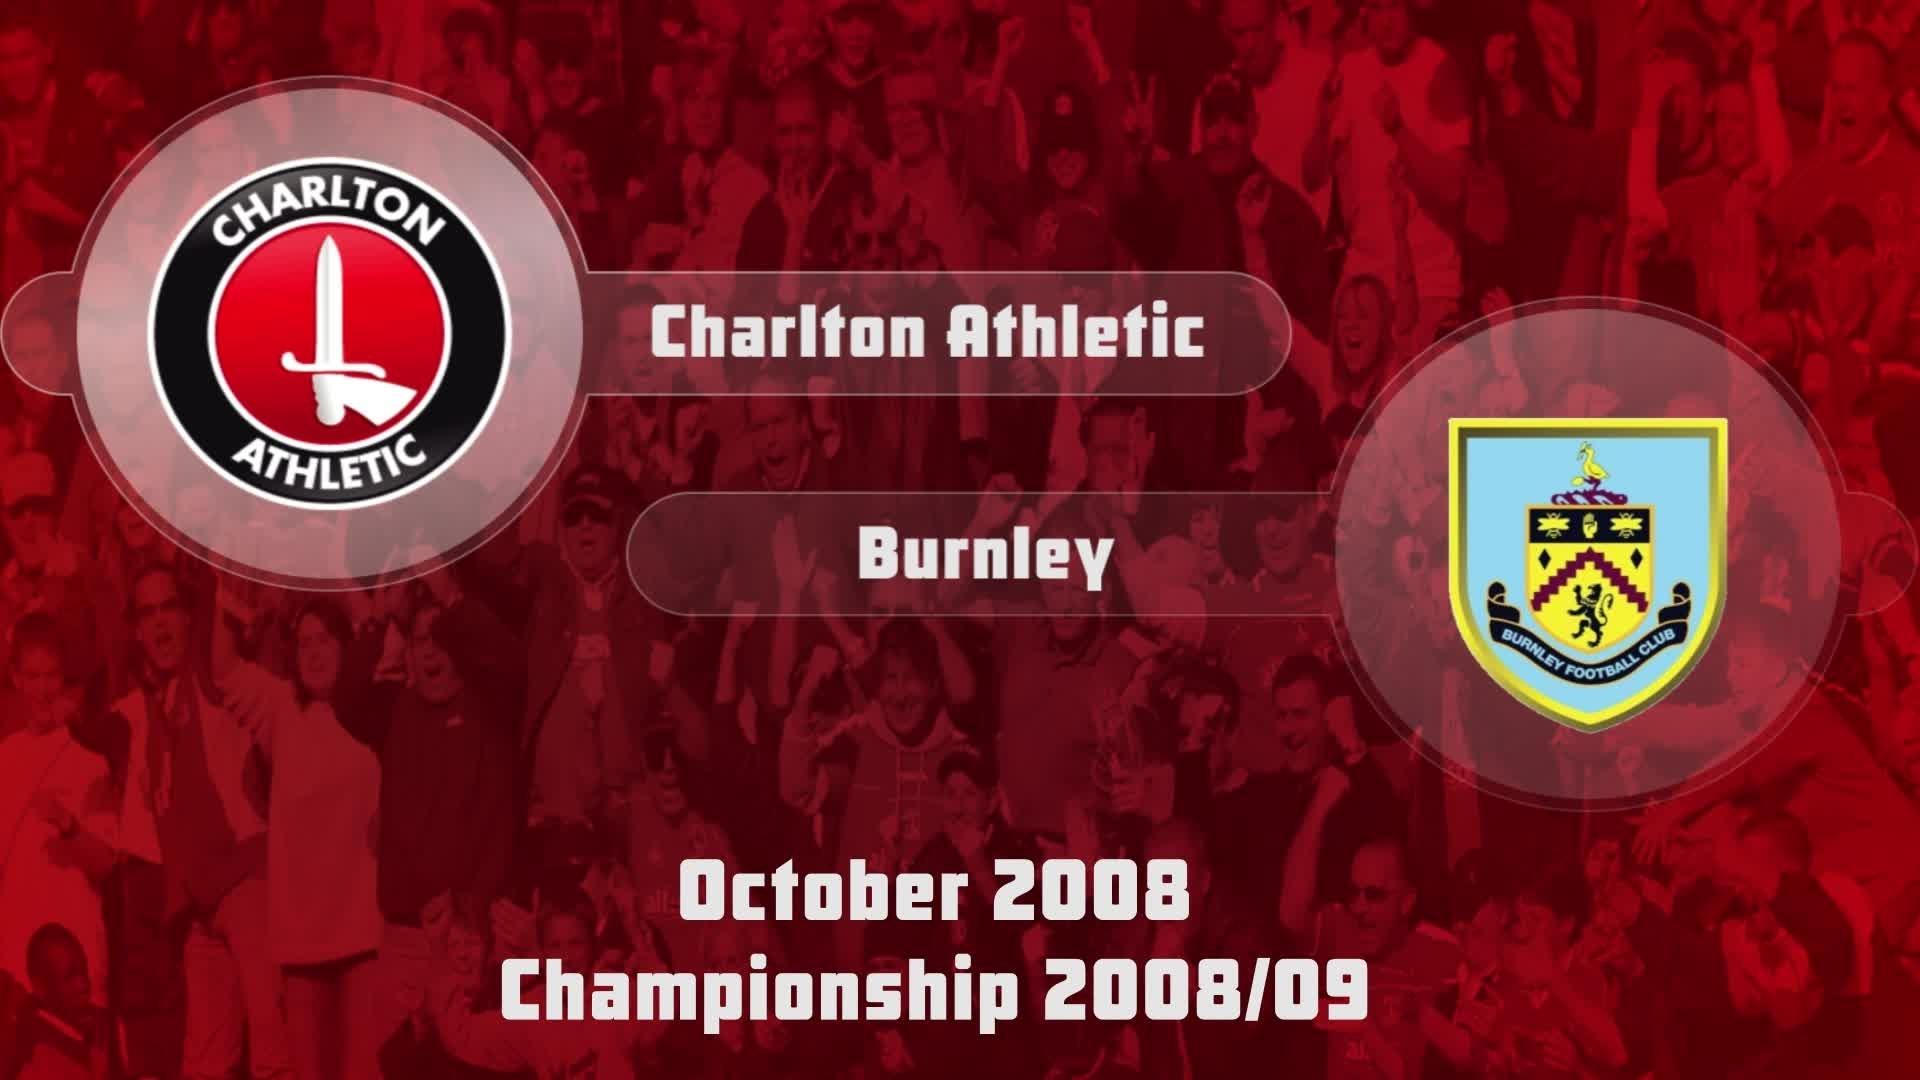 14 HIGHLIGHTS | Charlton 1 Burnley 1 (Oct 2008)